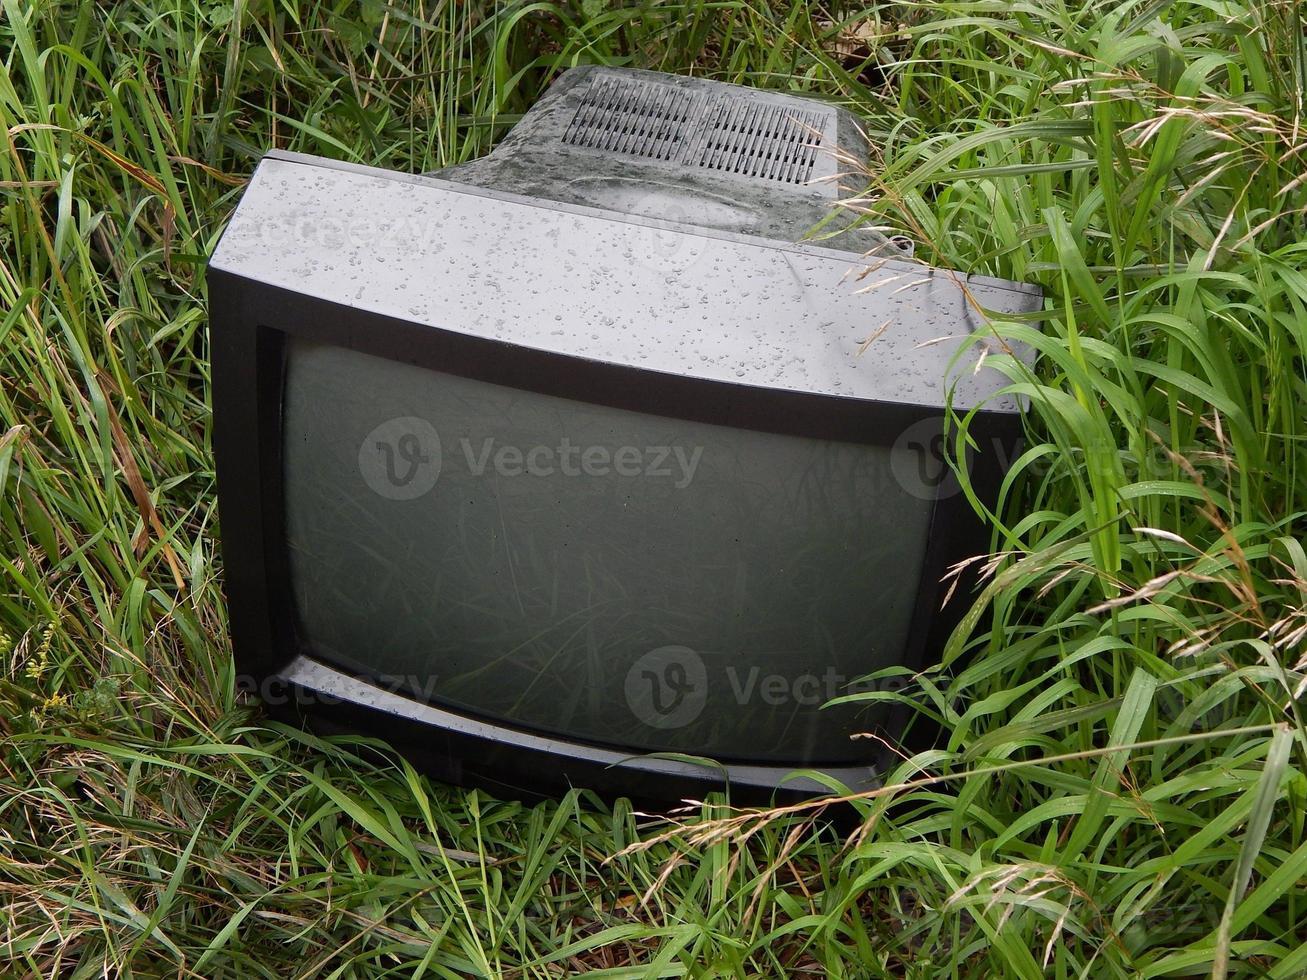 tv gegooid foto